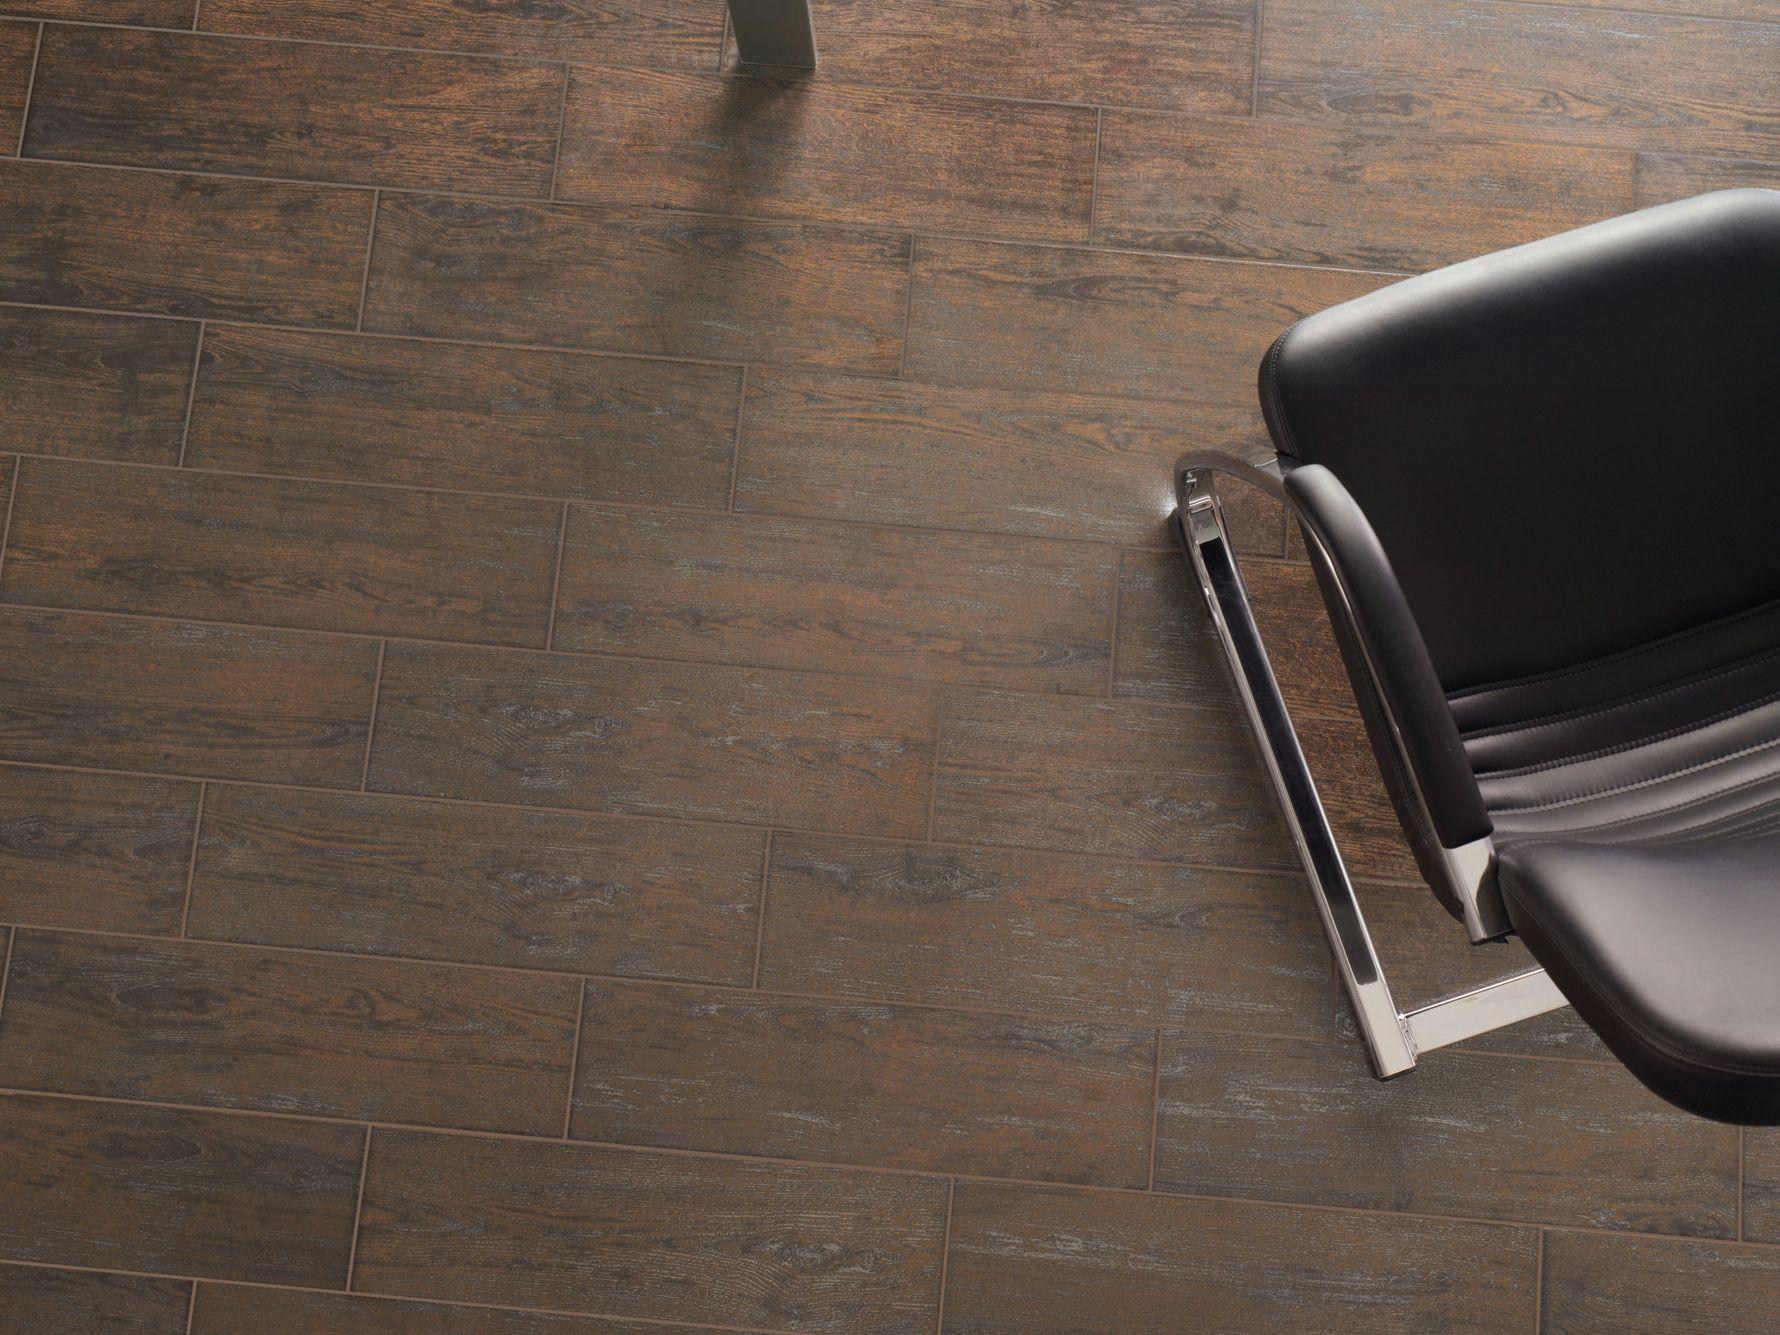 Pavimento de gres porcel nico imitaci n madera metal wood - Pavimento imitacion madera ...